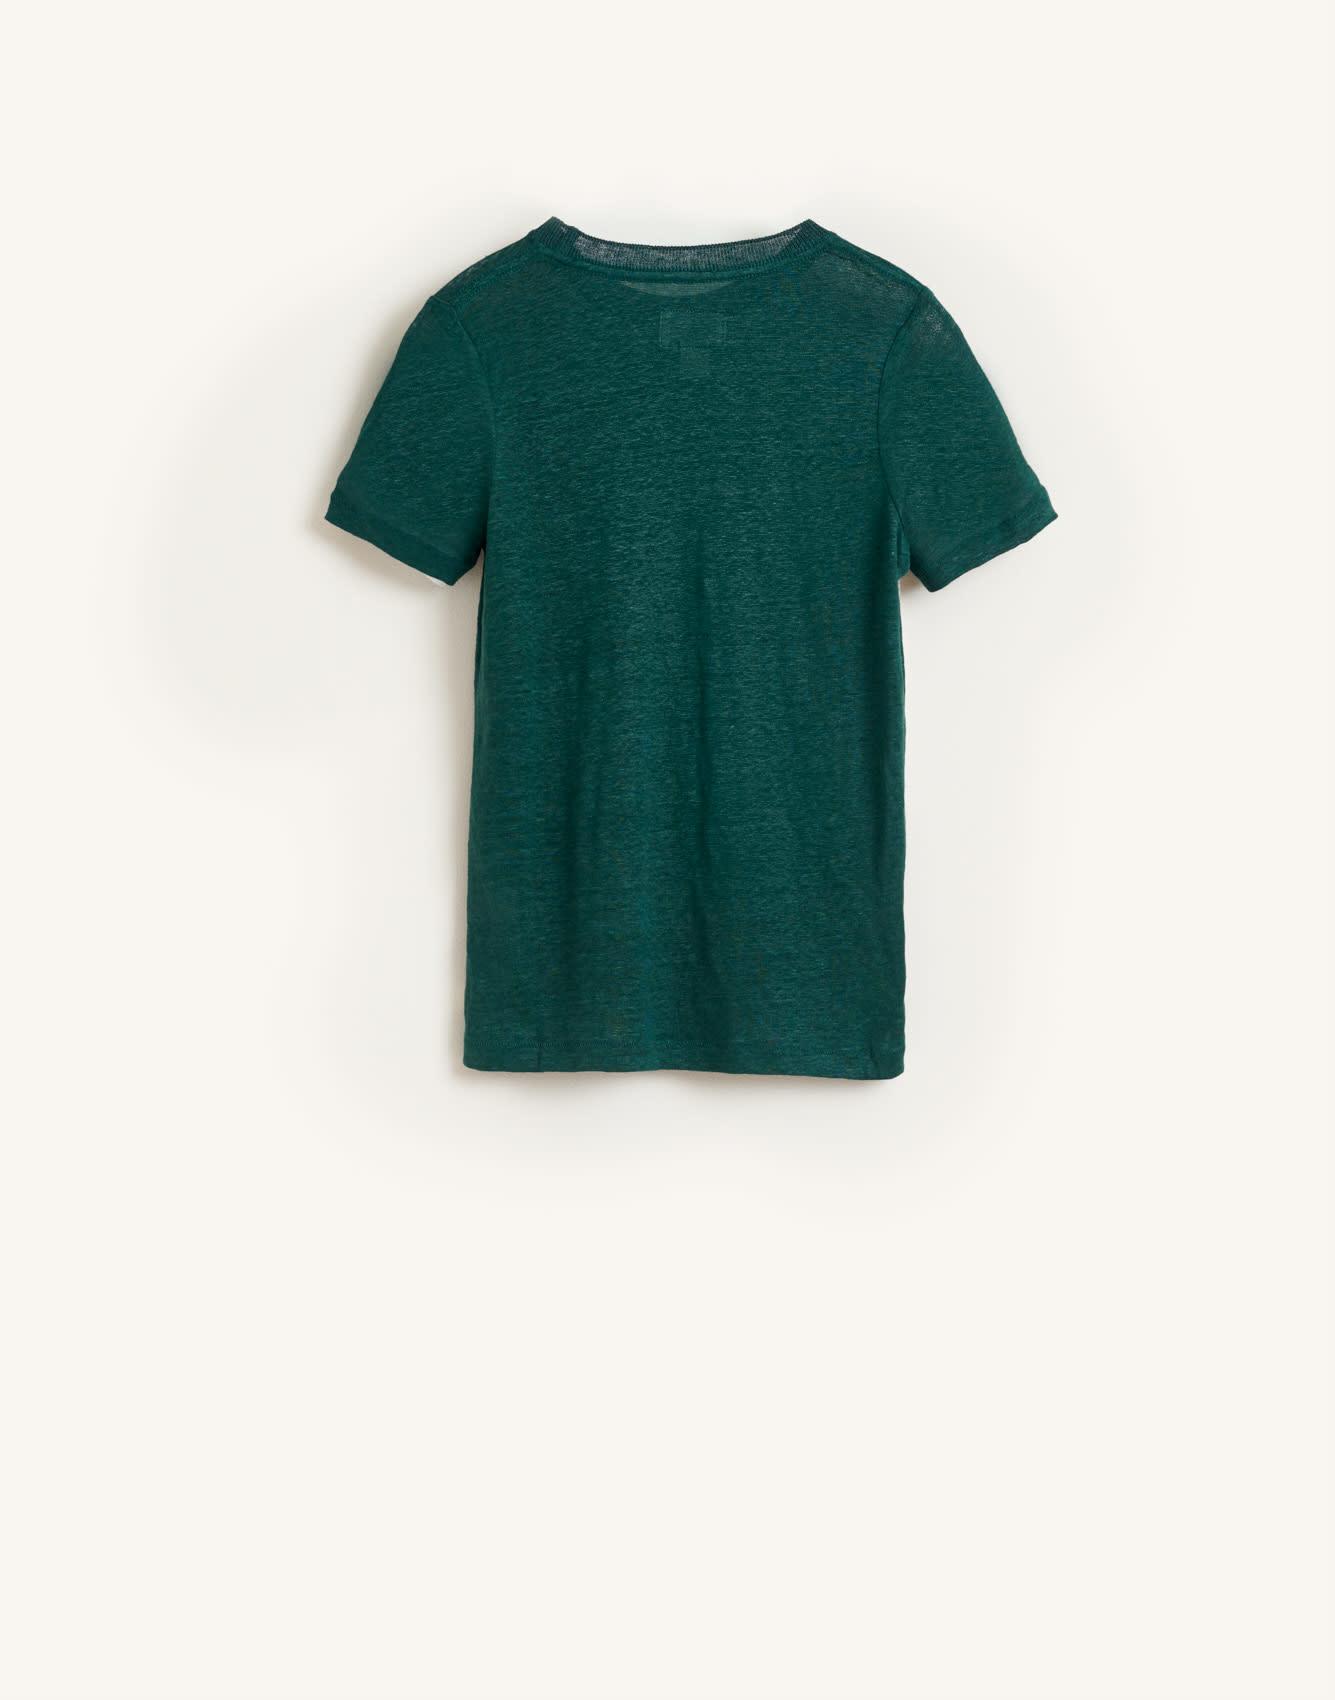 T-shirt pacific-2